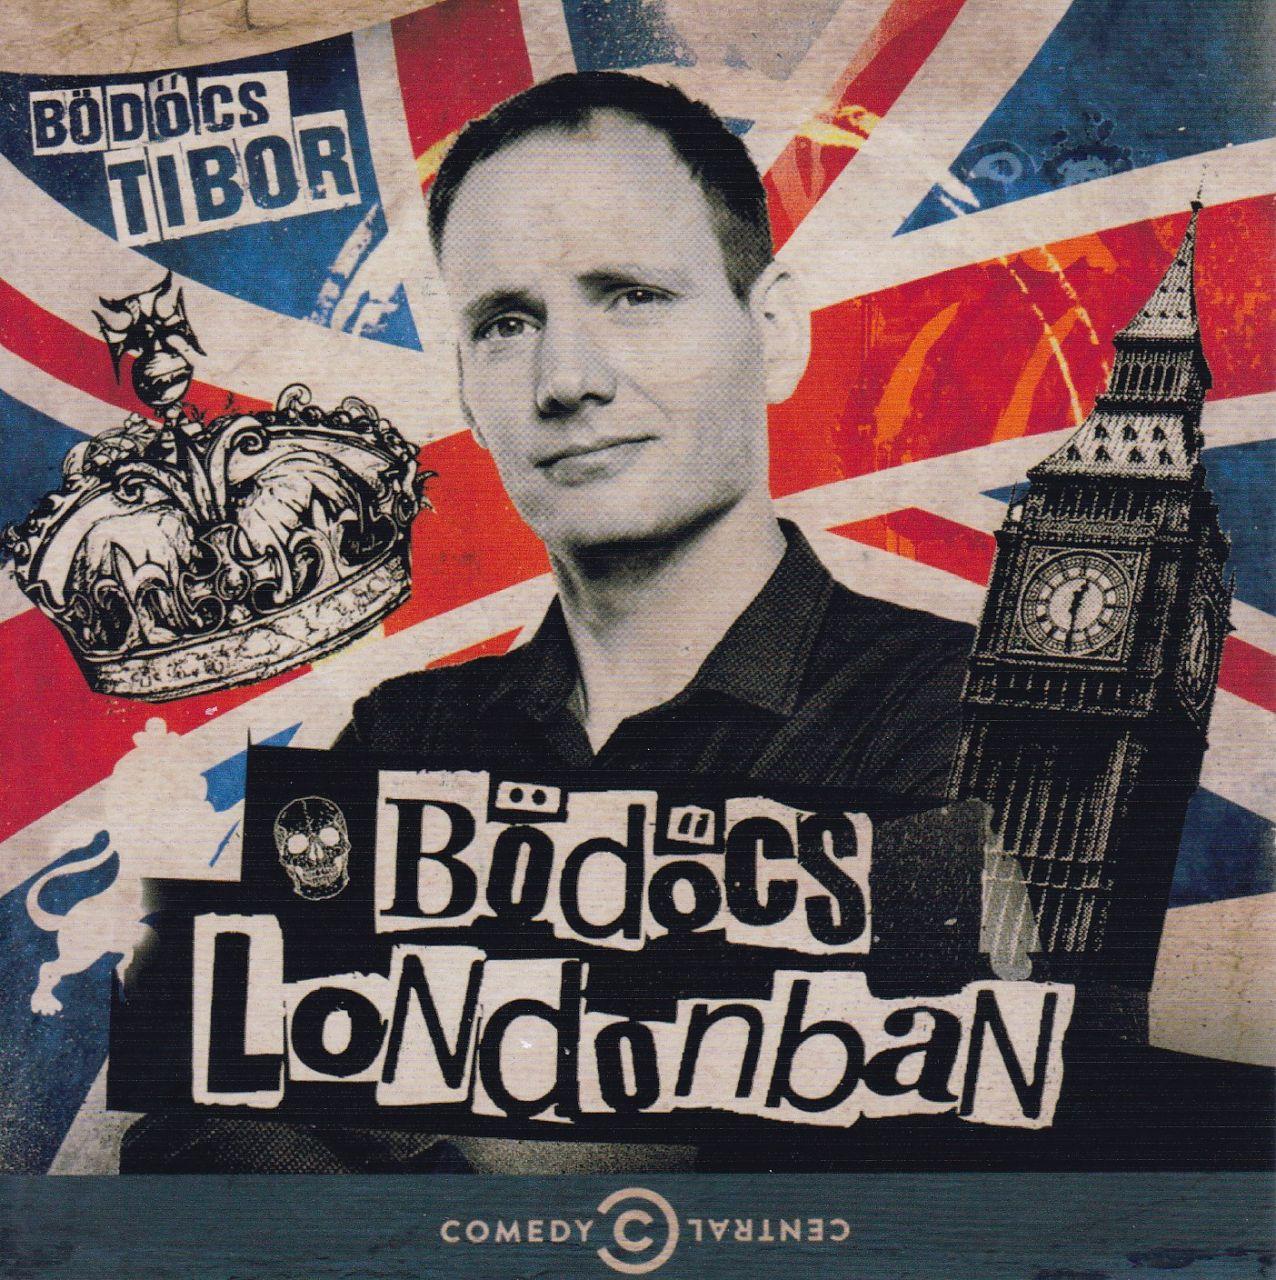 Bödőcs Tibor: Bödőcs Londonban (CD)